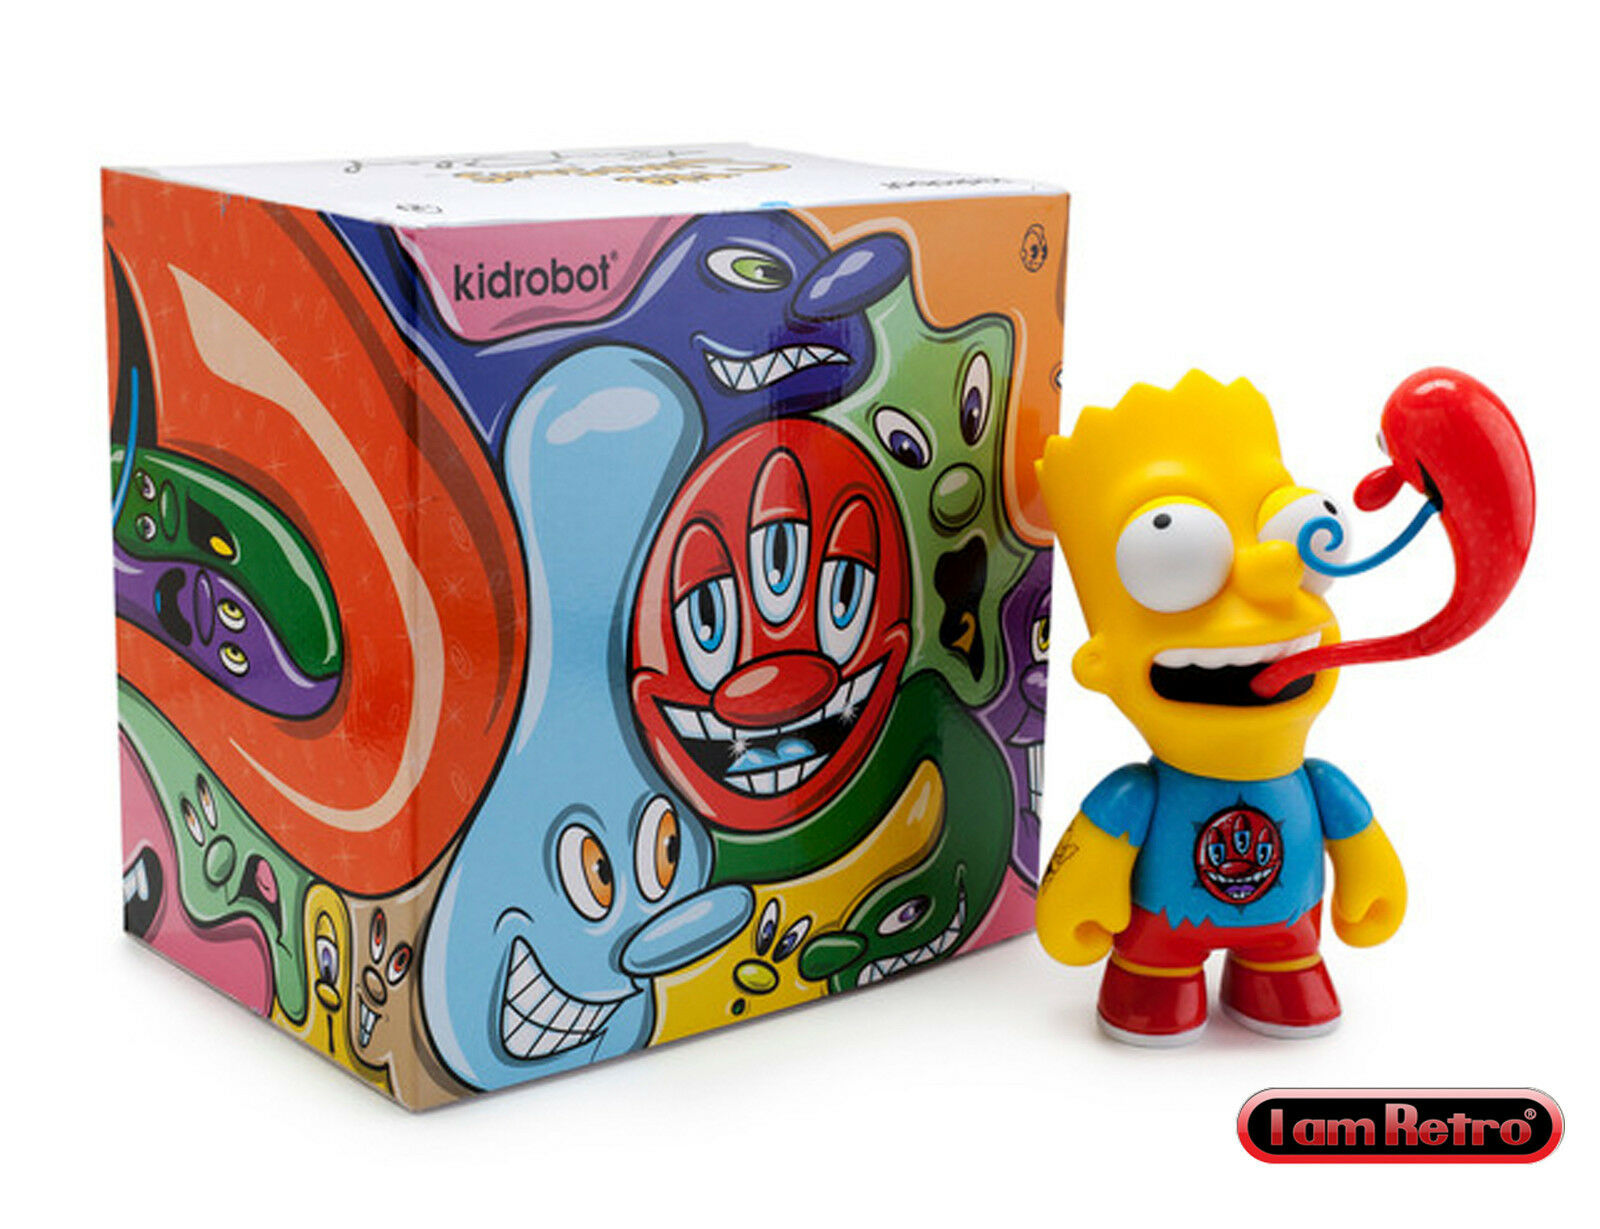 Bart Simpson 6 inch Vinyl Figure by artist Kenny Scharf x Kidrobot Brand New